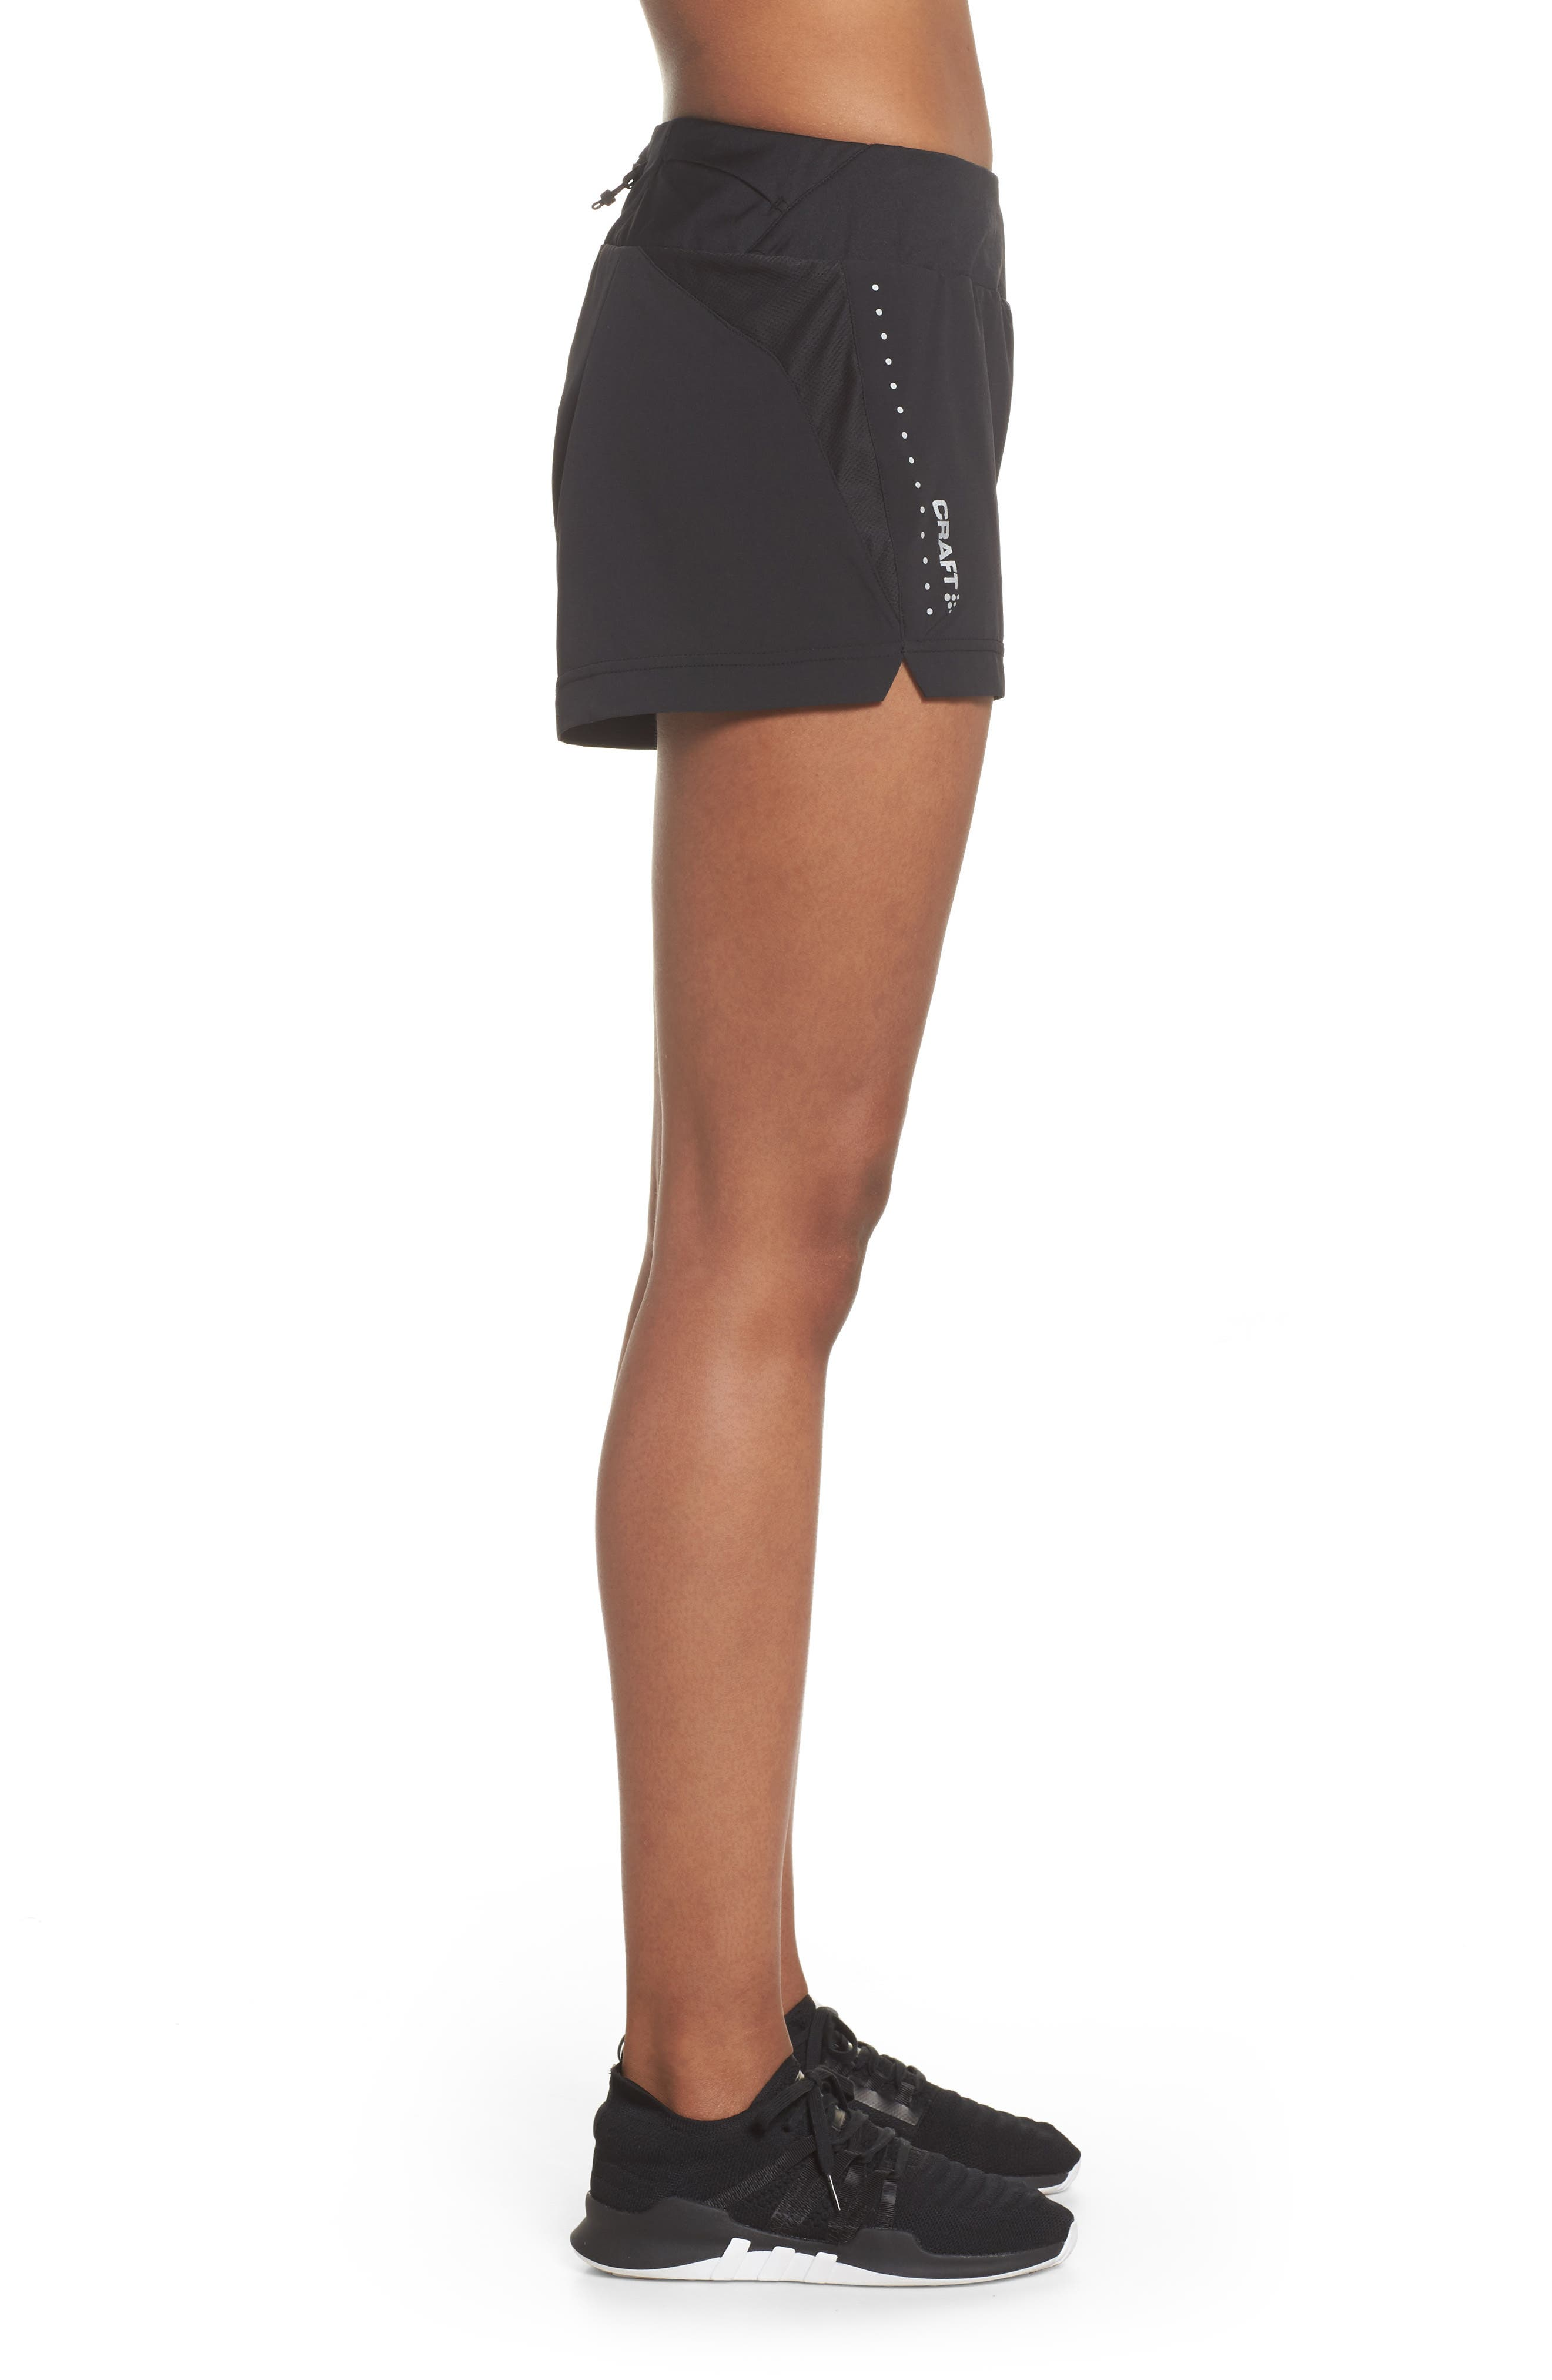 Essential Running Shorts,                             Alternate thumbnail 6, color,                             Black